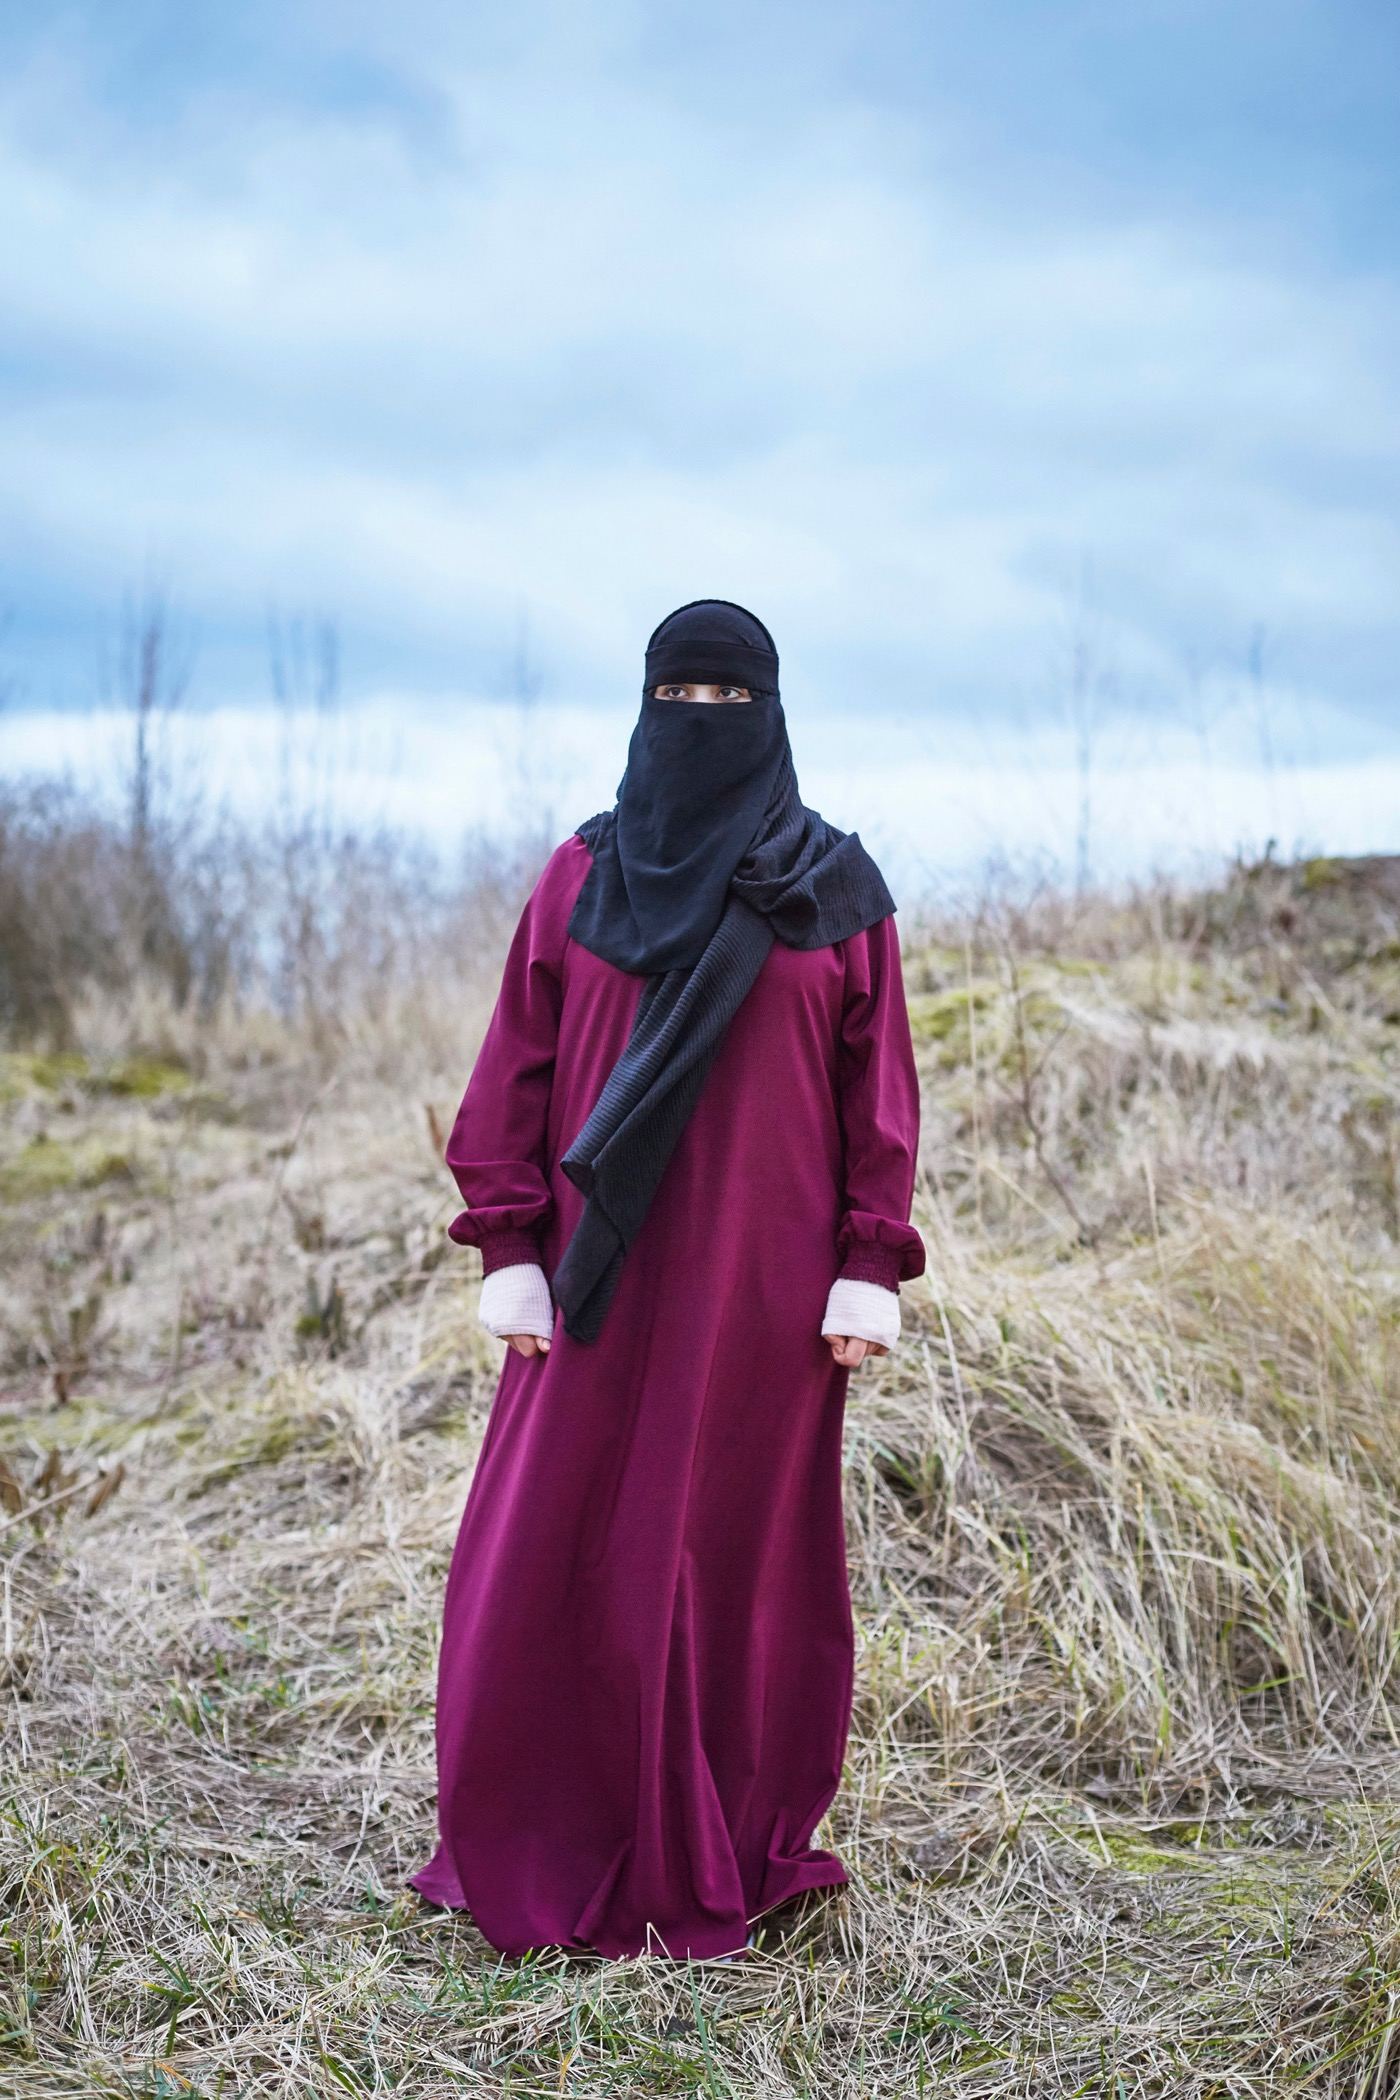 Selina Pfrüner zeigt lebensgroße, auf Stoffe projizierte Video-Portraits.